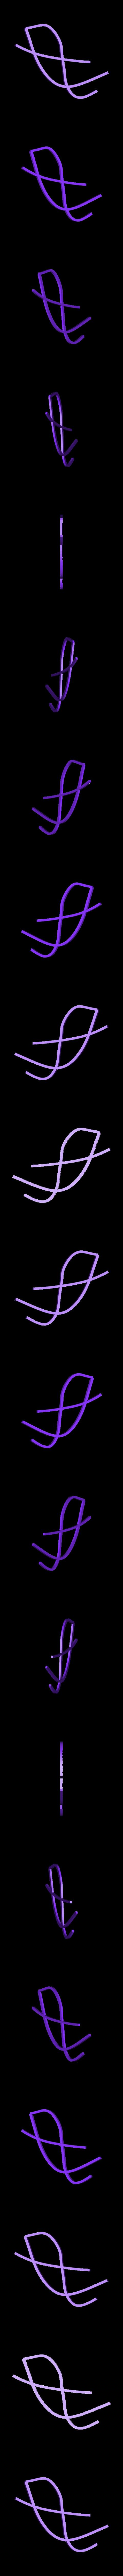 rocket_part_3.stl Download free STL file N++ Designs • 3D printable template, Toomblercazz